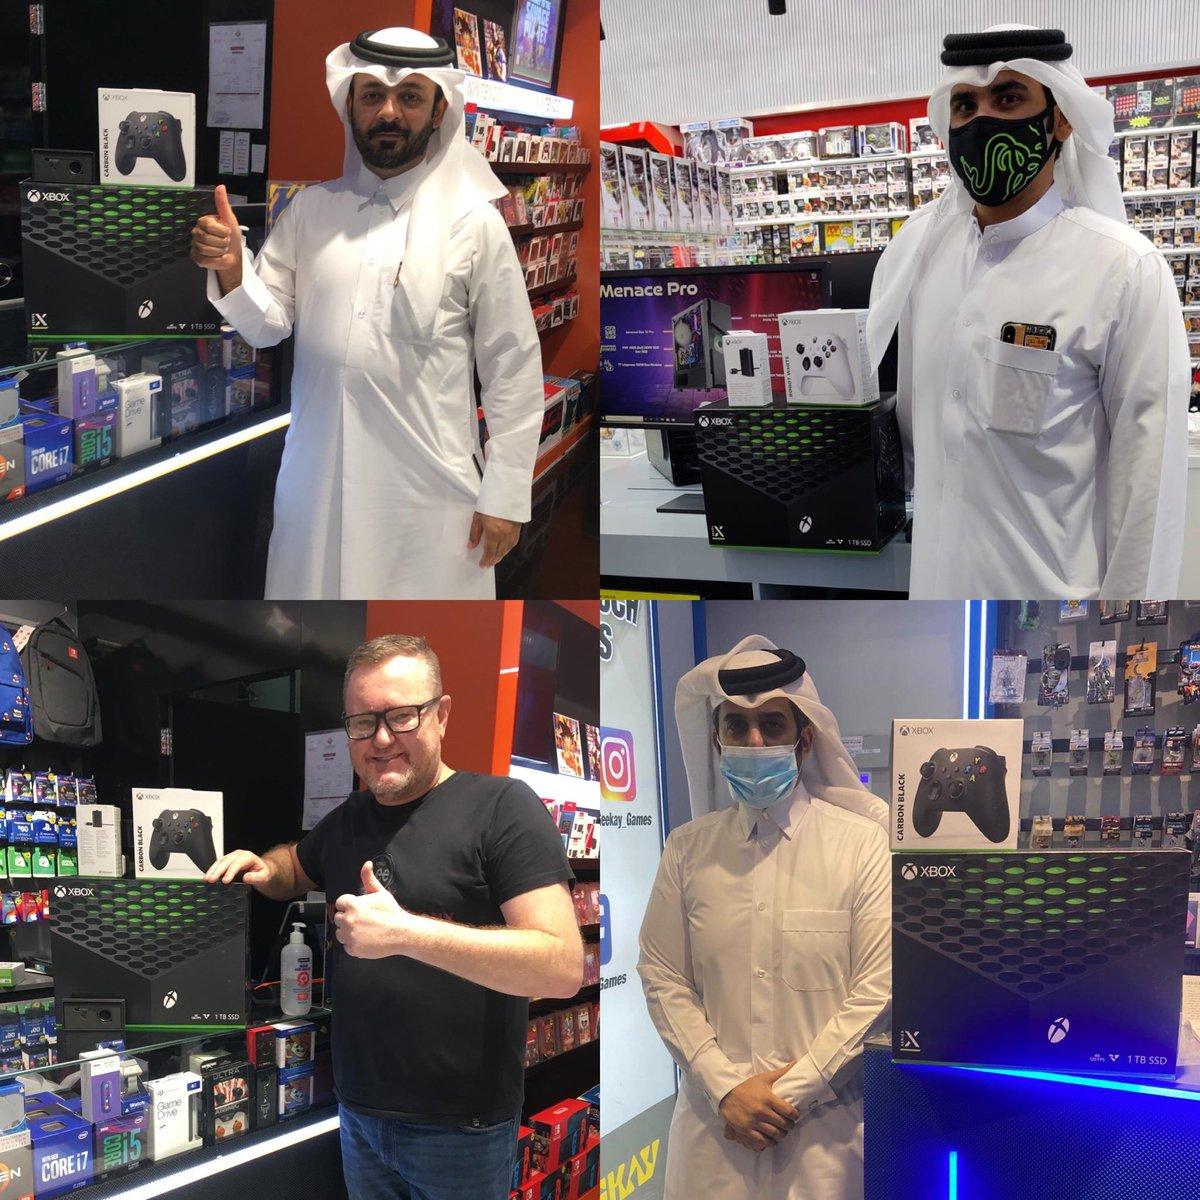 Qatari fans getting the new #XboxSeriesX @XboxGulf https://t.co/sqhHcIuLuj